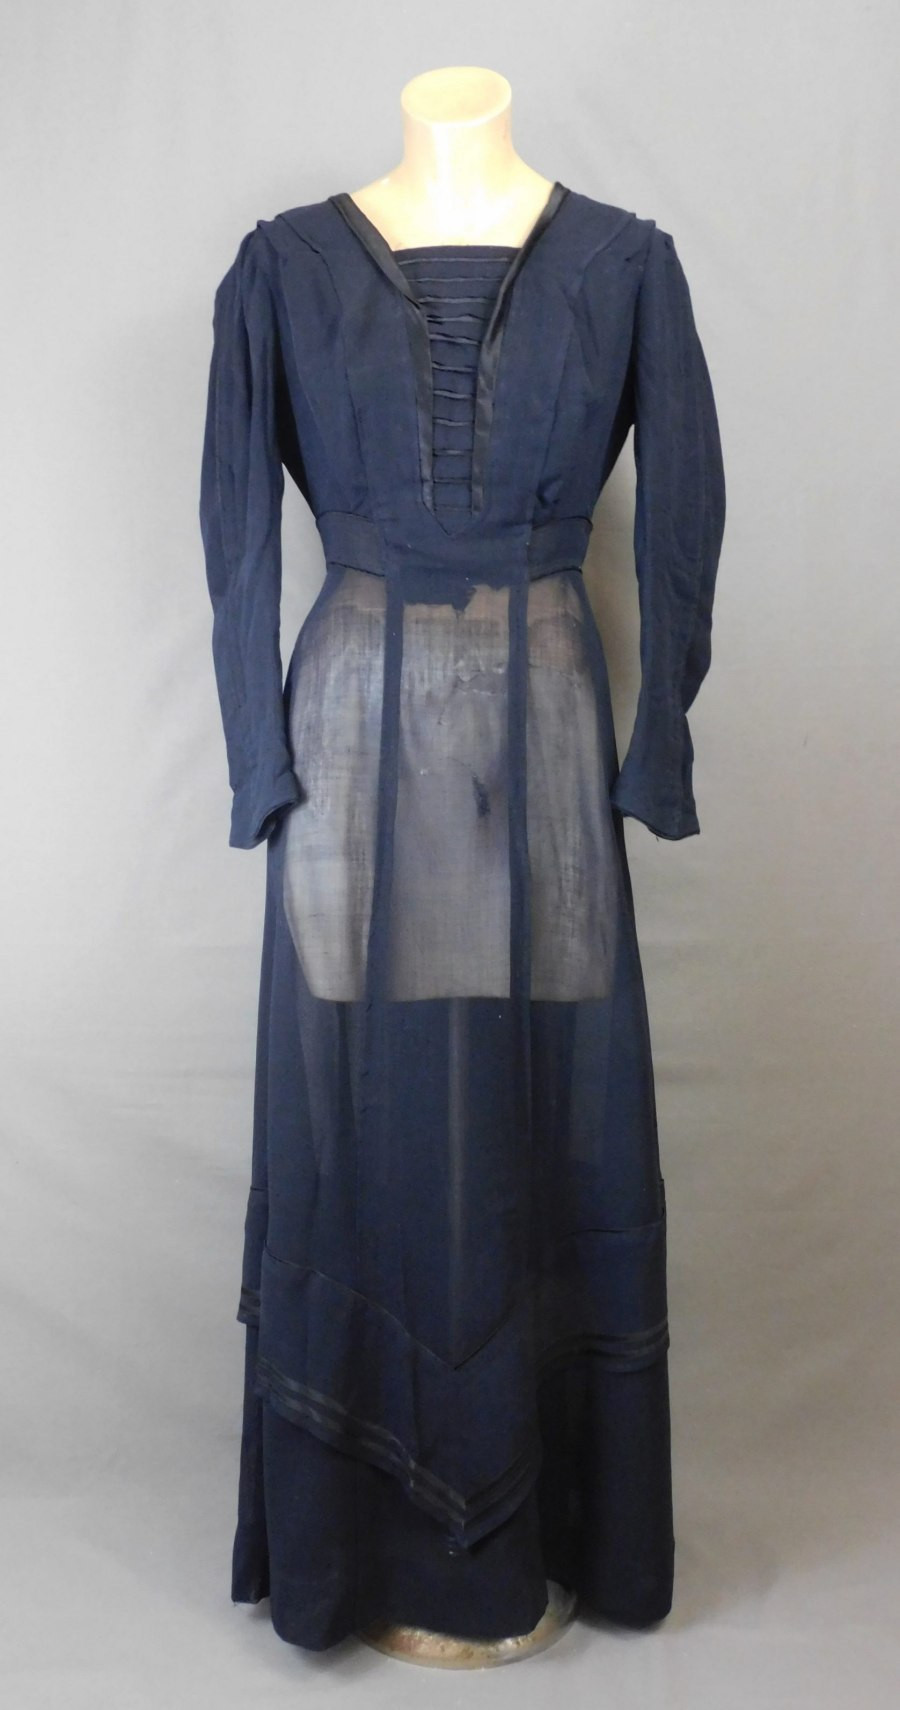 Vintage Edwardian Black Dress, fits 36 inch bust, Sheer Weaver, some issues